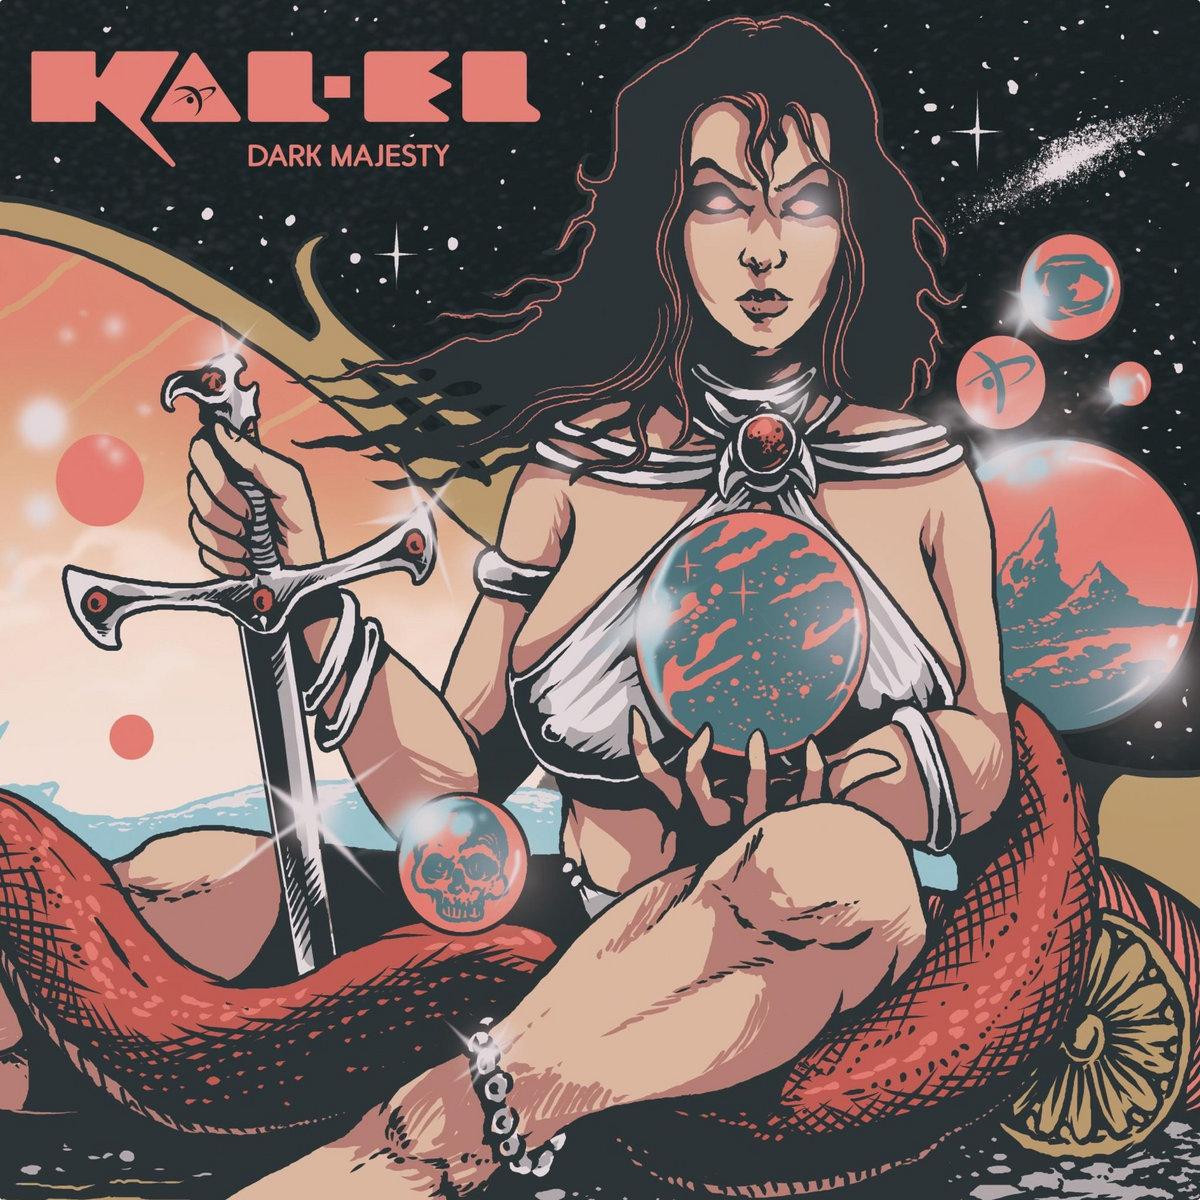 Reseña: KAL-EL.- 'DarkMajesty'